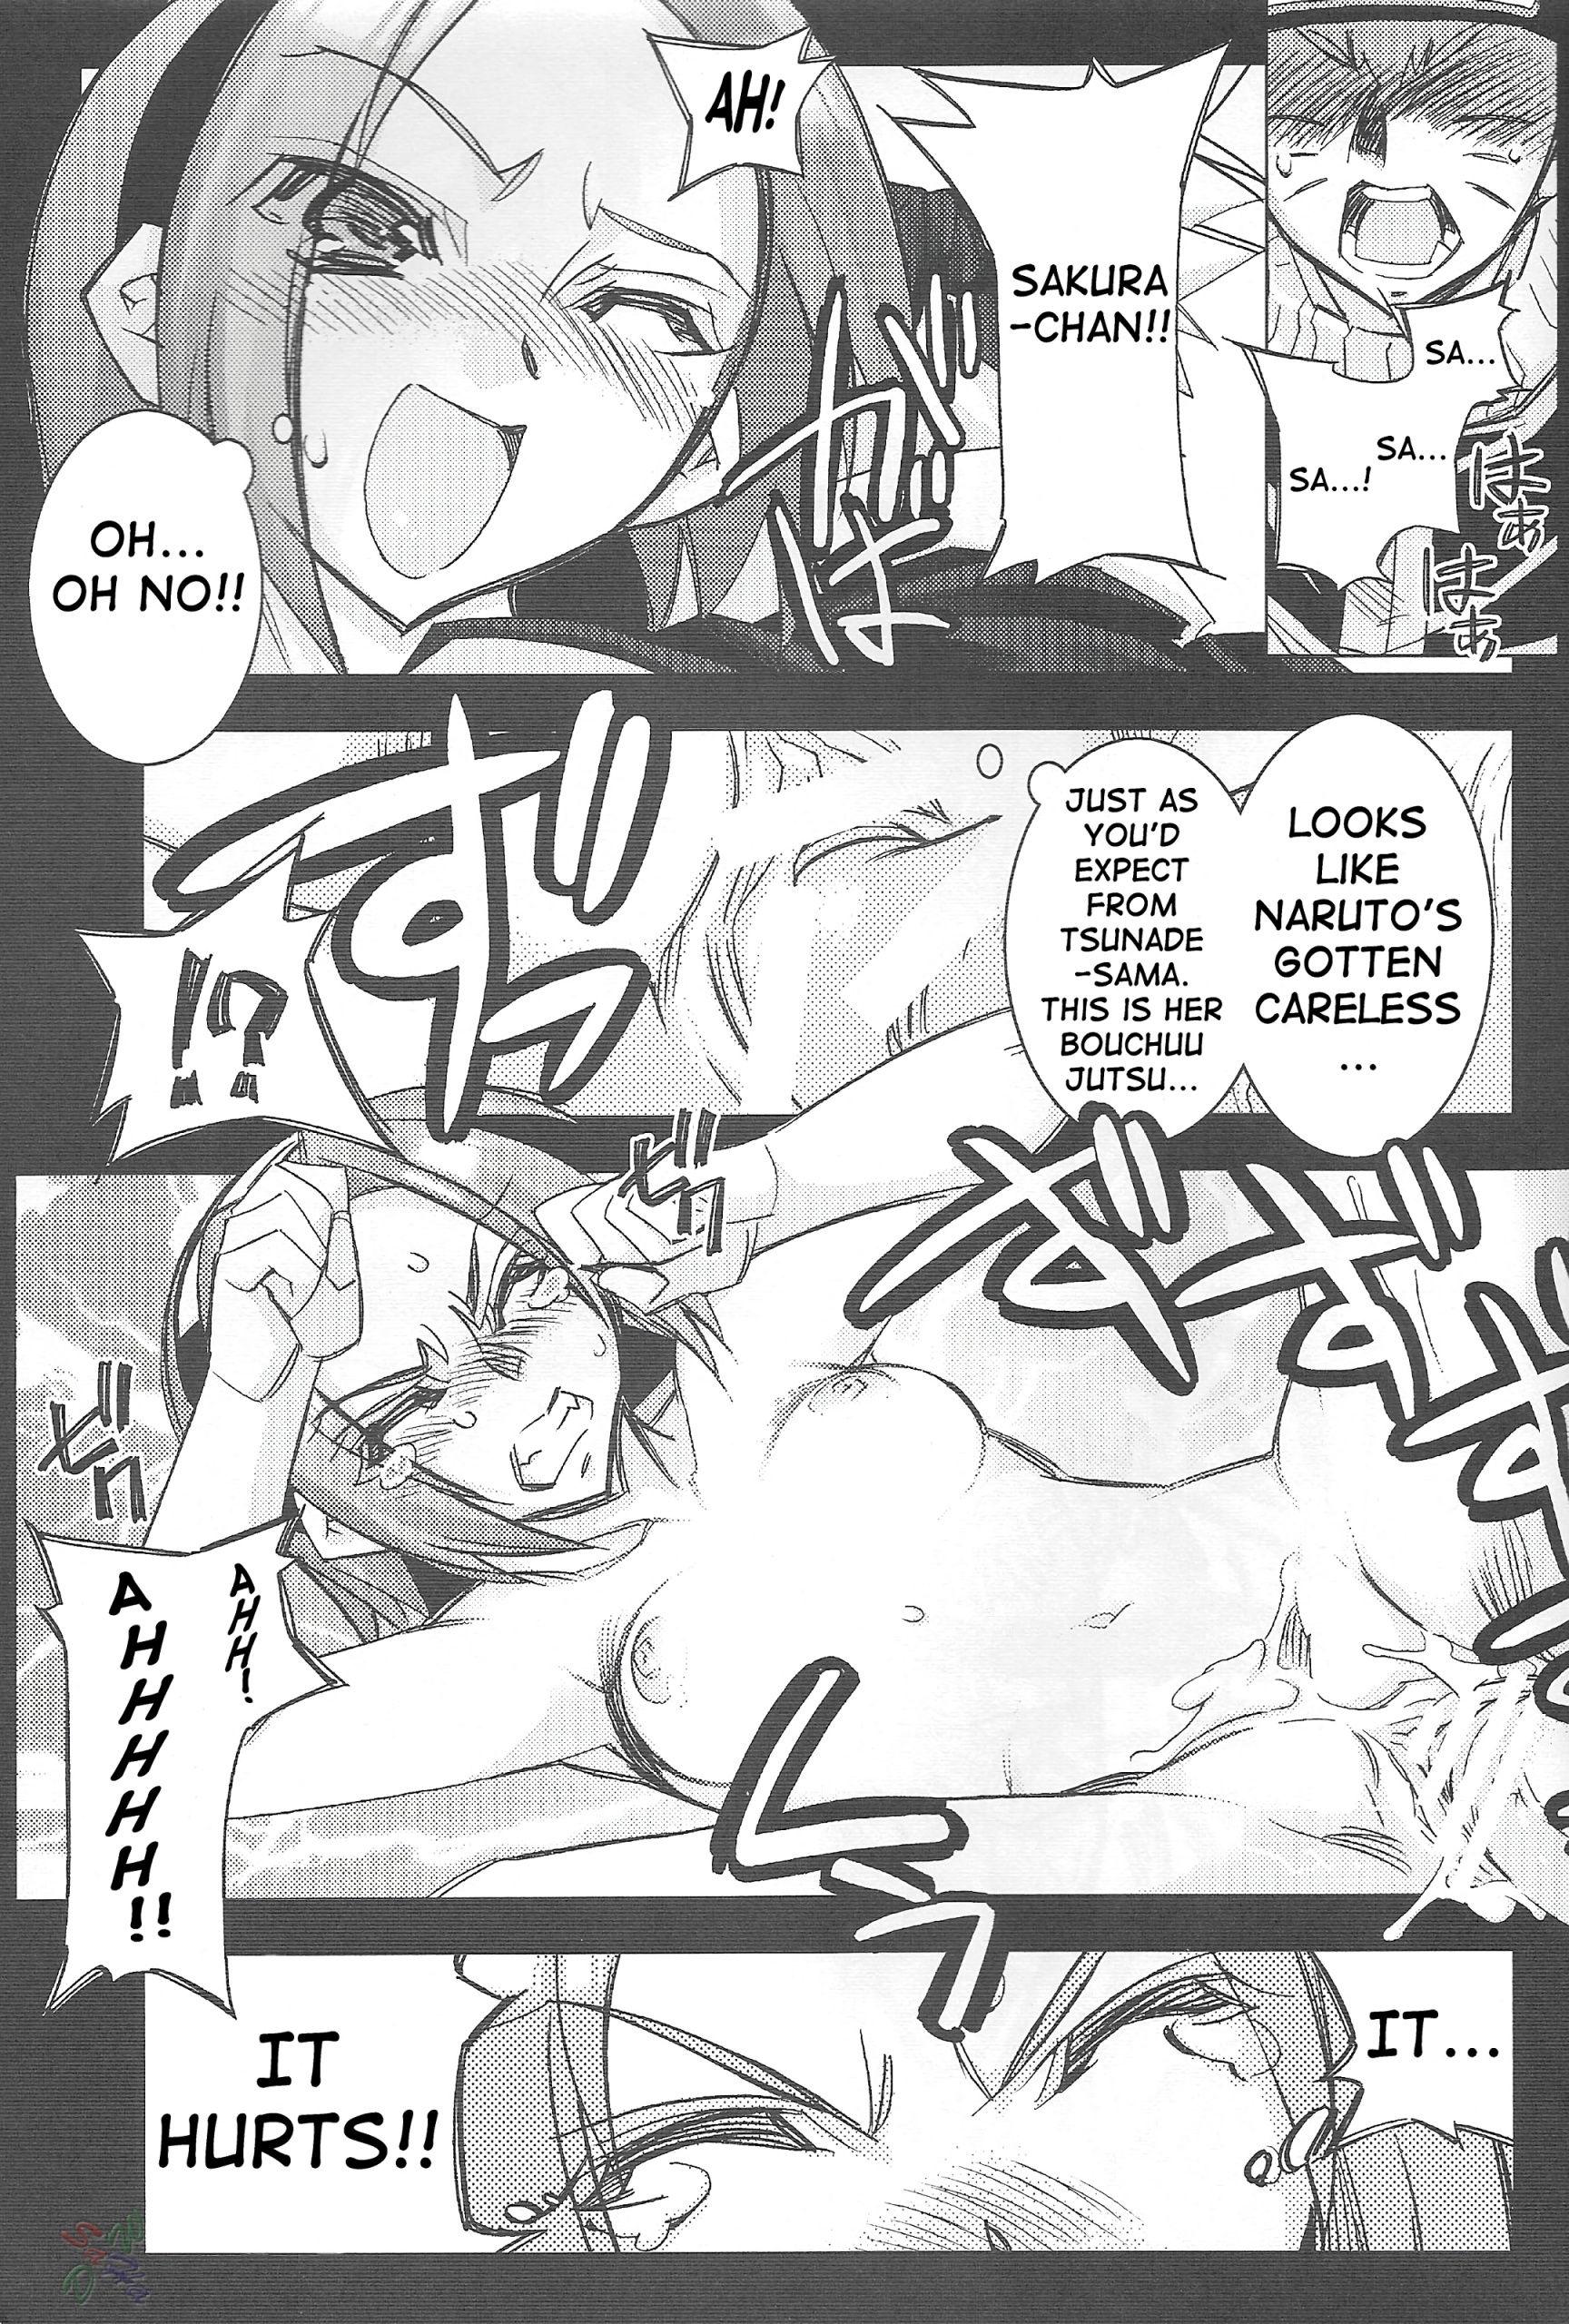 Sakurasaku heisei juunana nen hentai manga picture 8